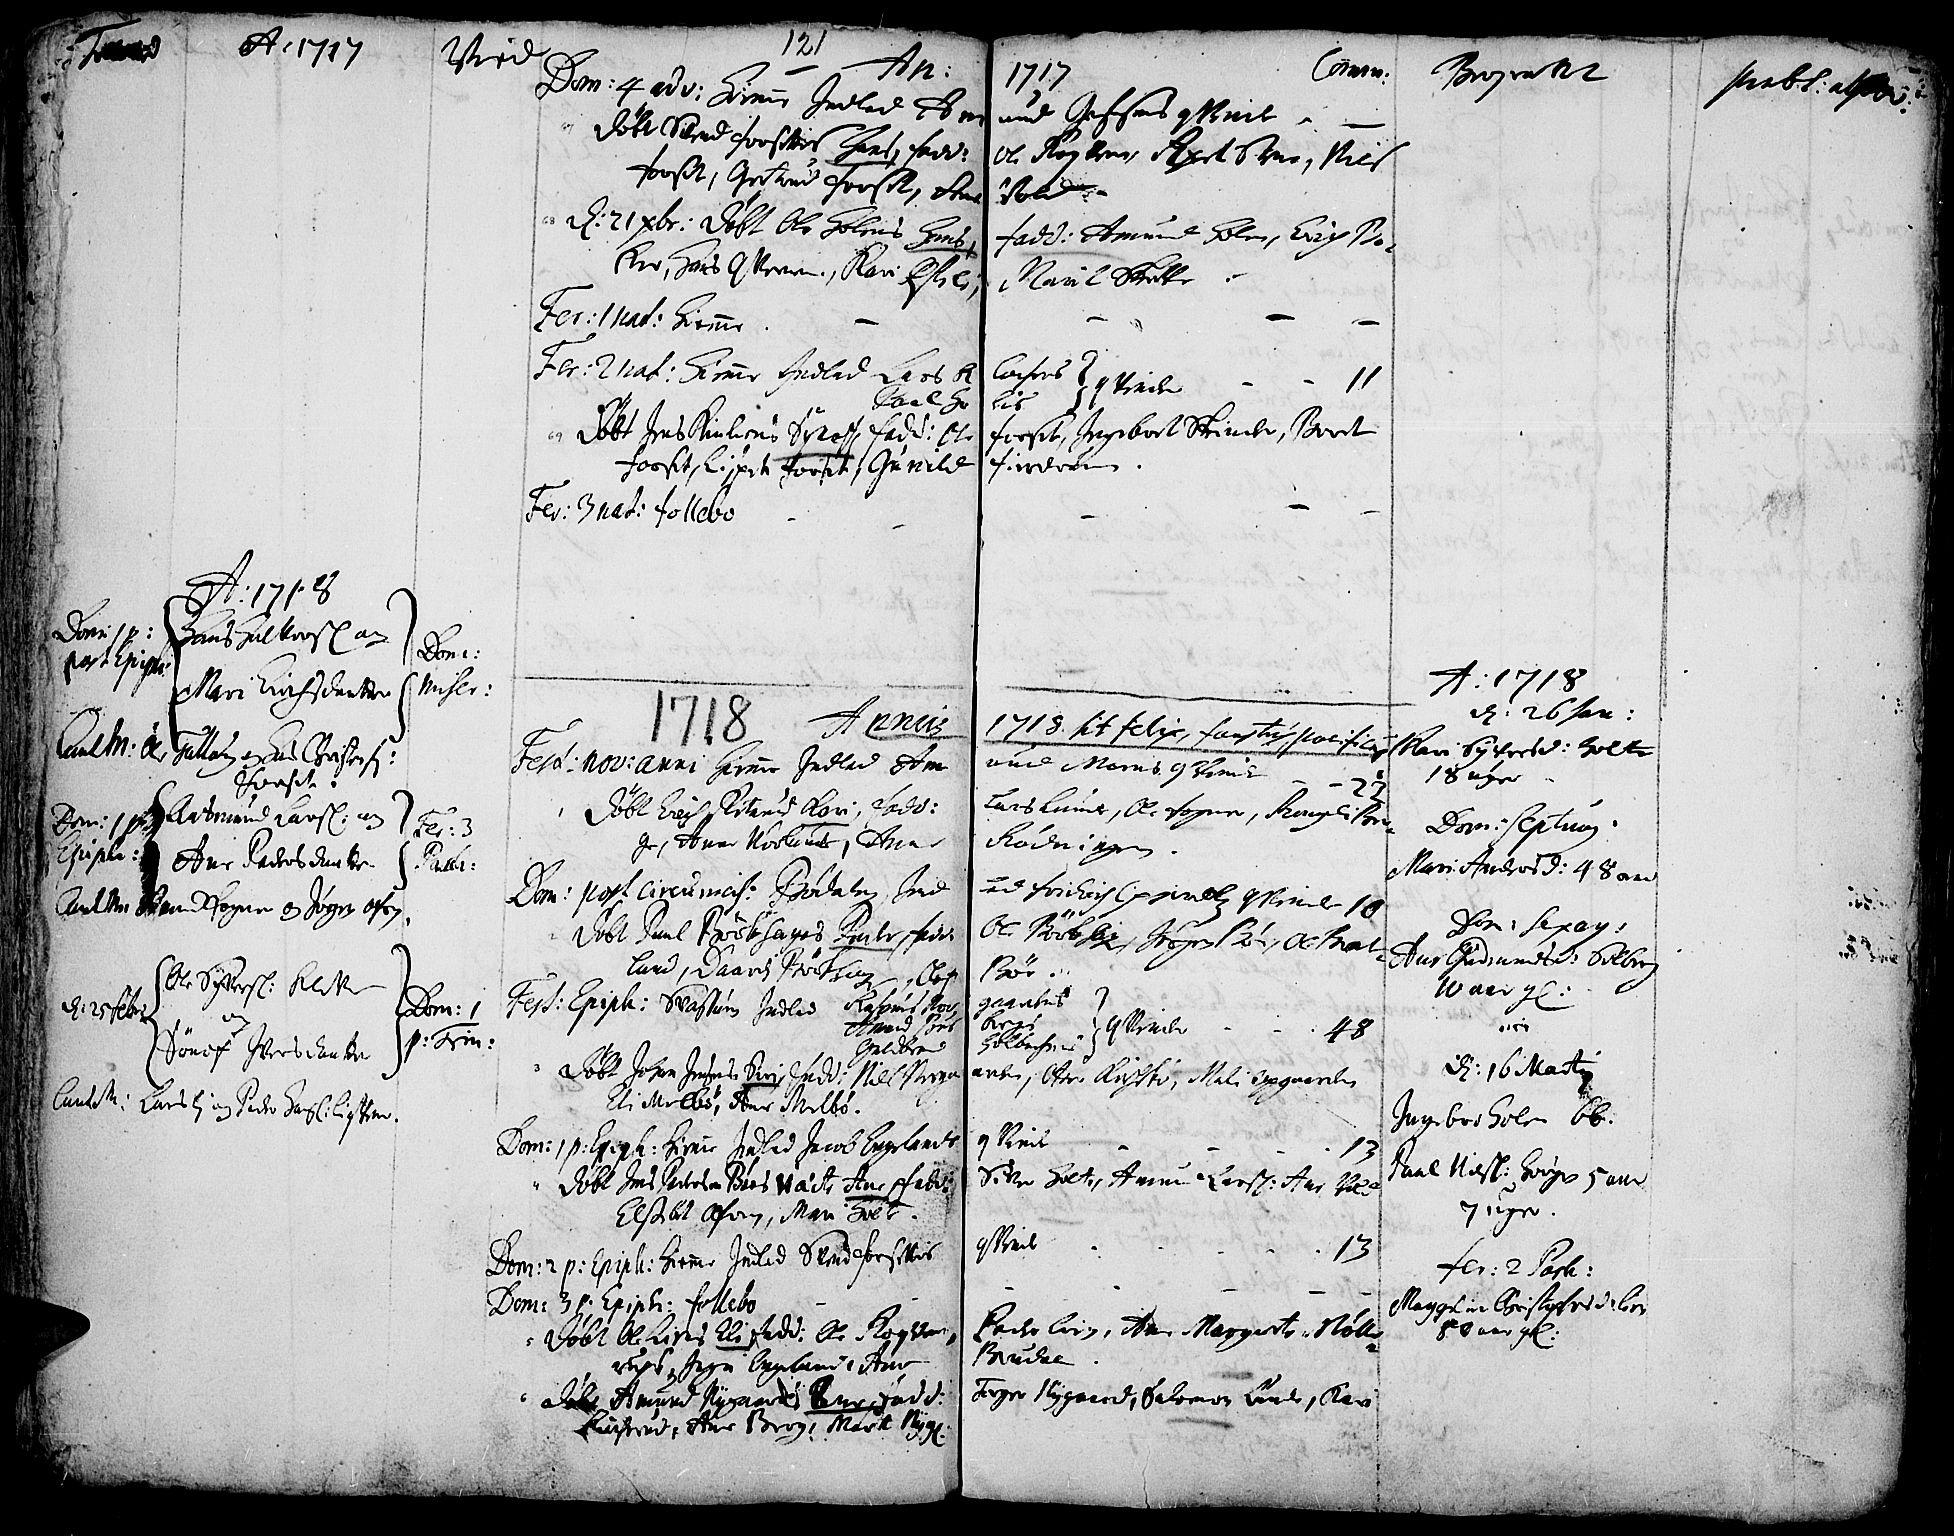 SAH, Gausdal prestekontor, Ministerialbok nr. 1, 1693-1728, s. 121